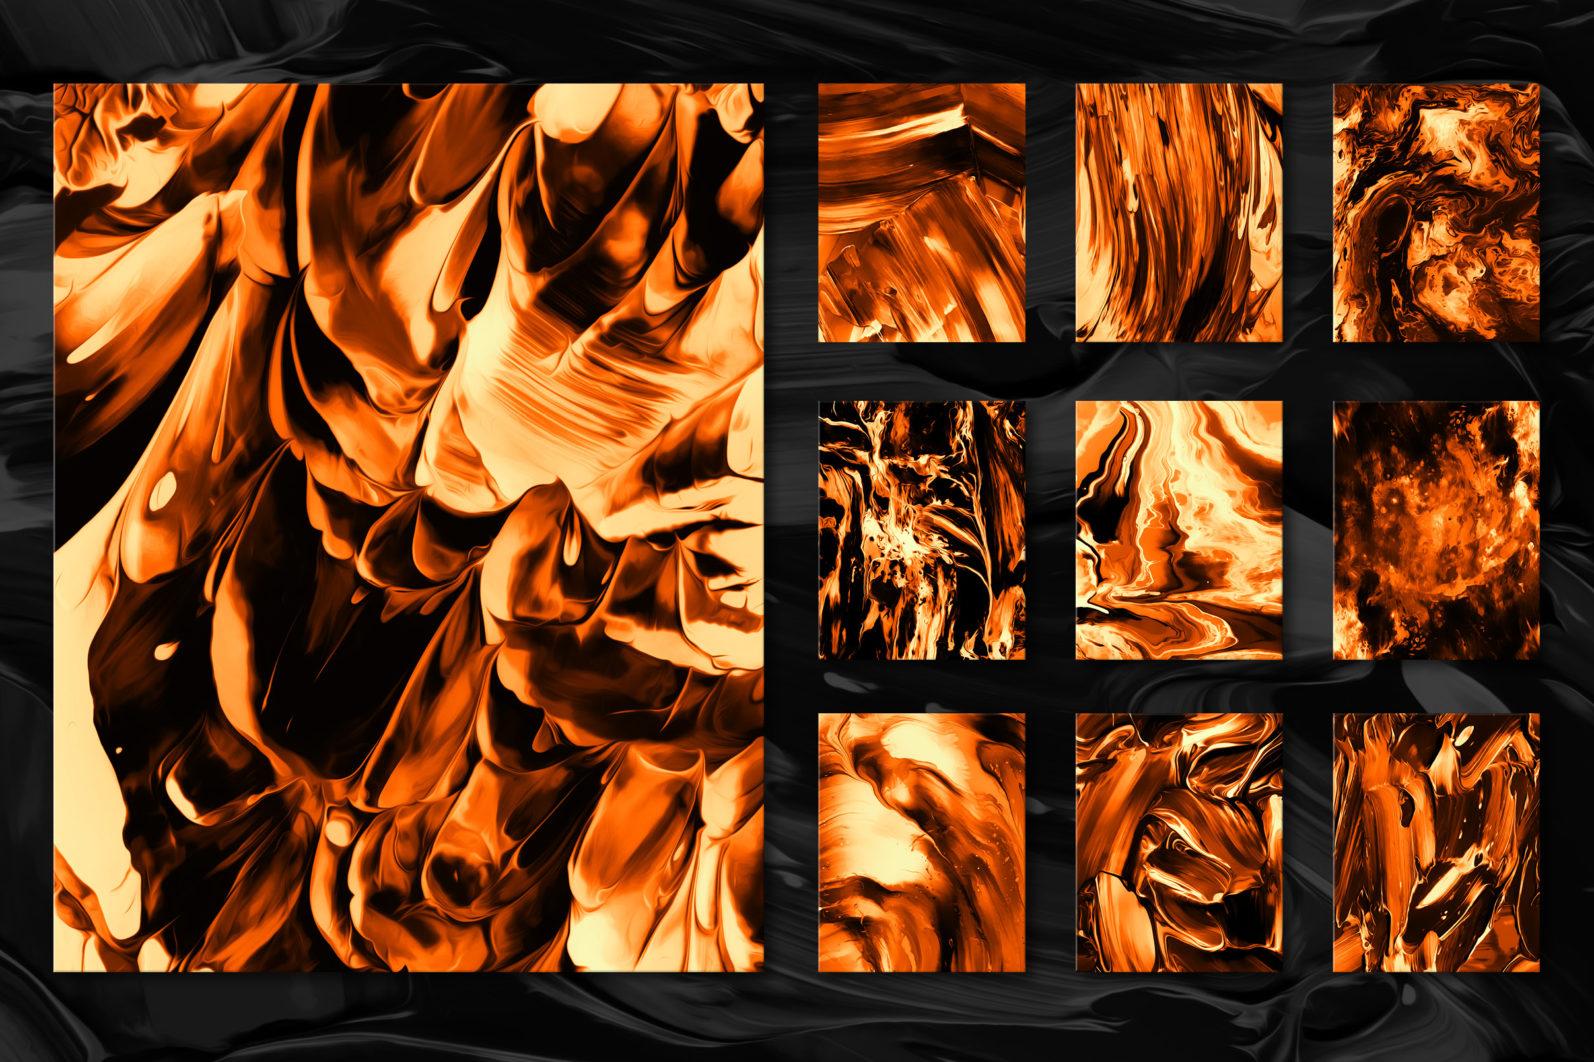 Flow, Vol. 2: 100 Smooth Paint Textures - Flow Vol 2 Preview 10 -